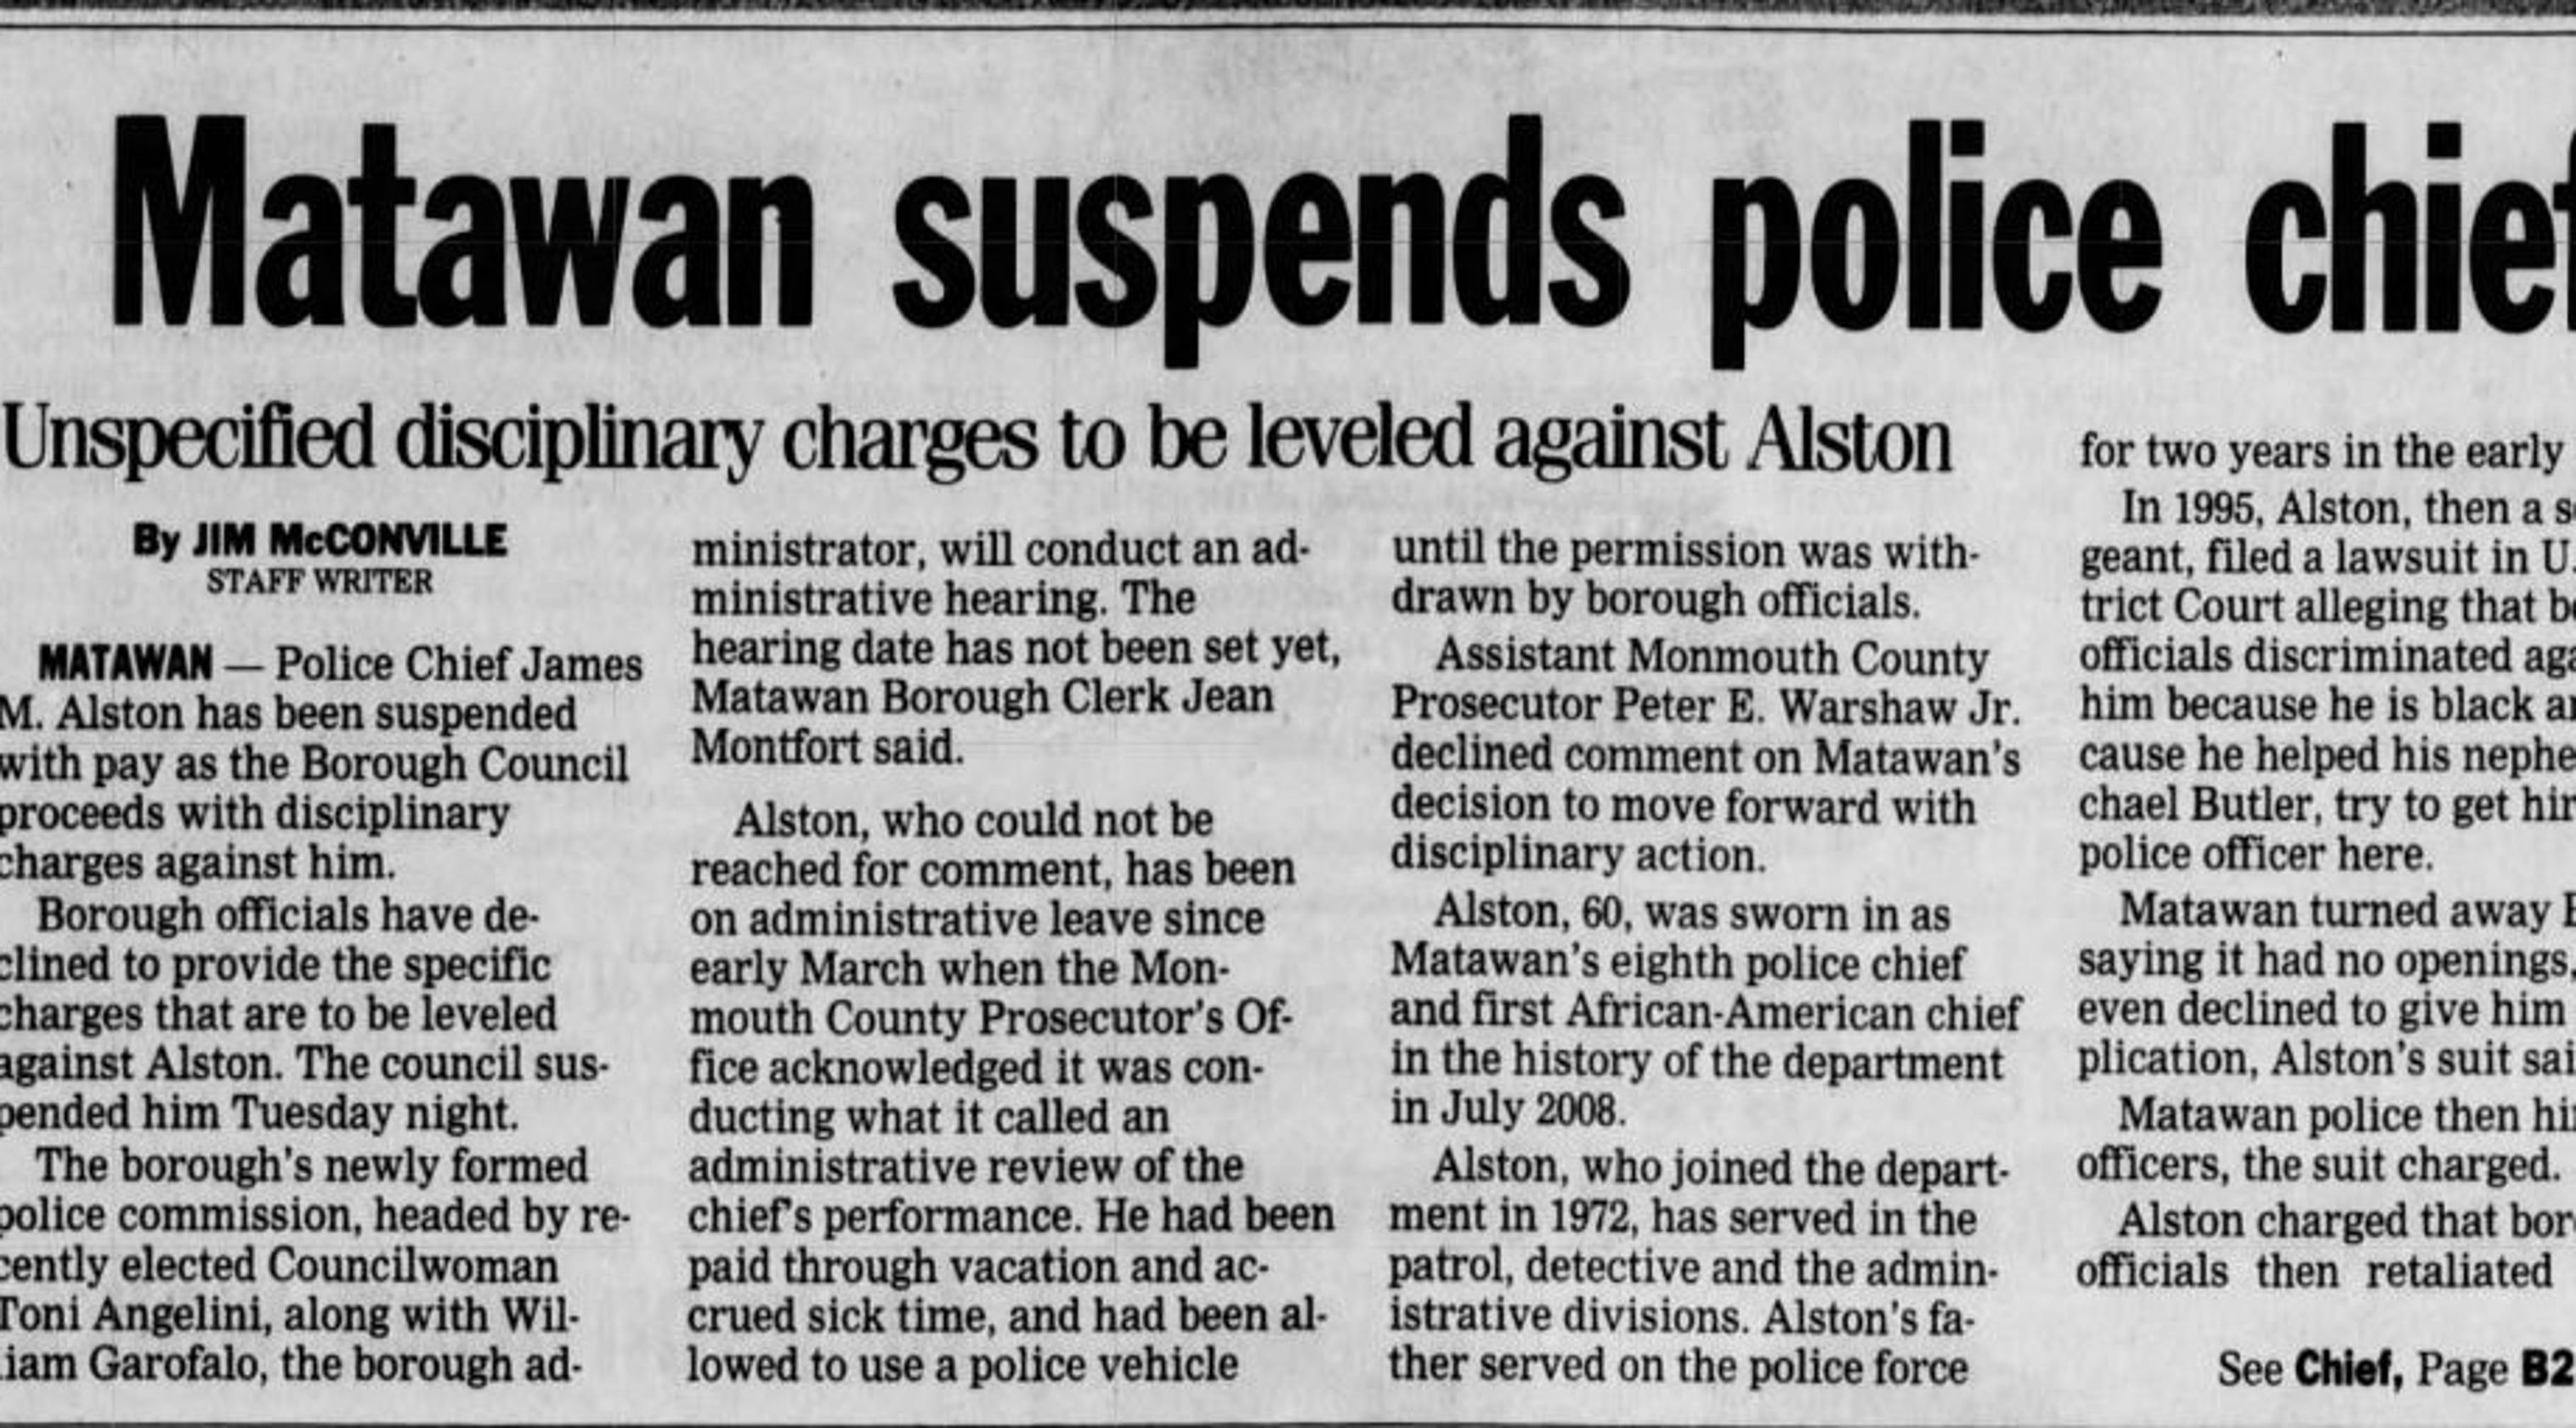 Matawan discrimination lawsuits: Alston's demotion